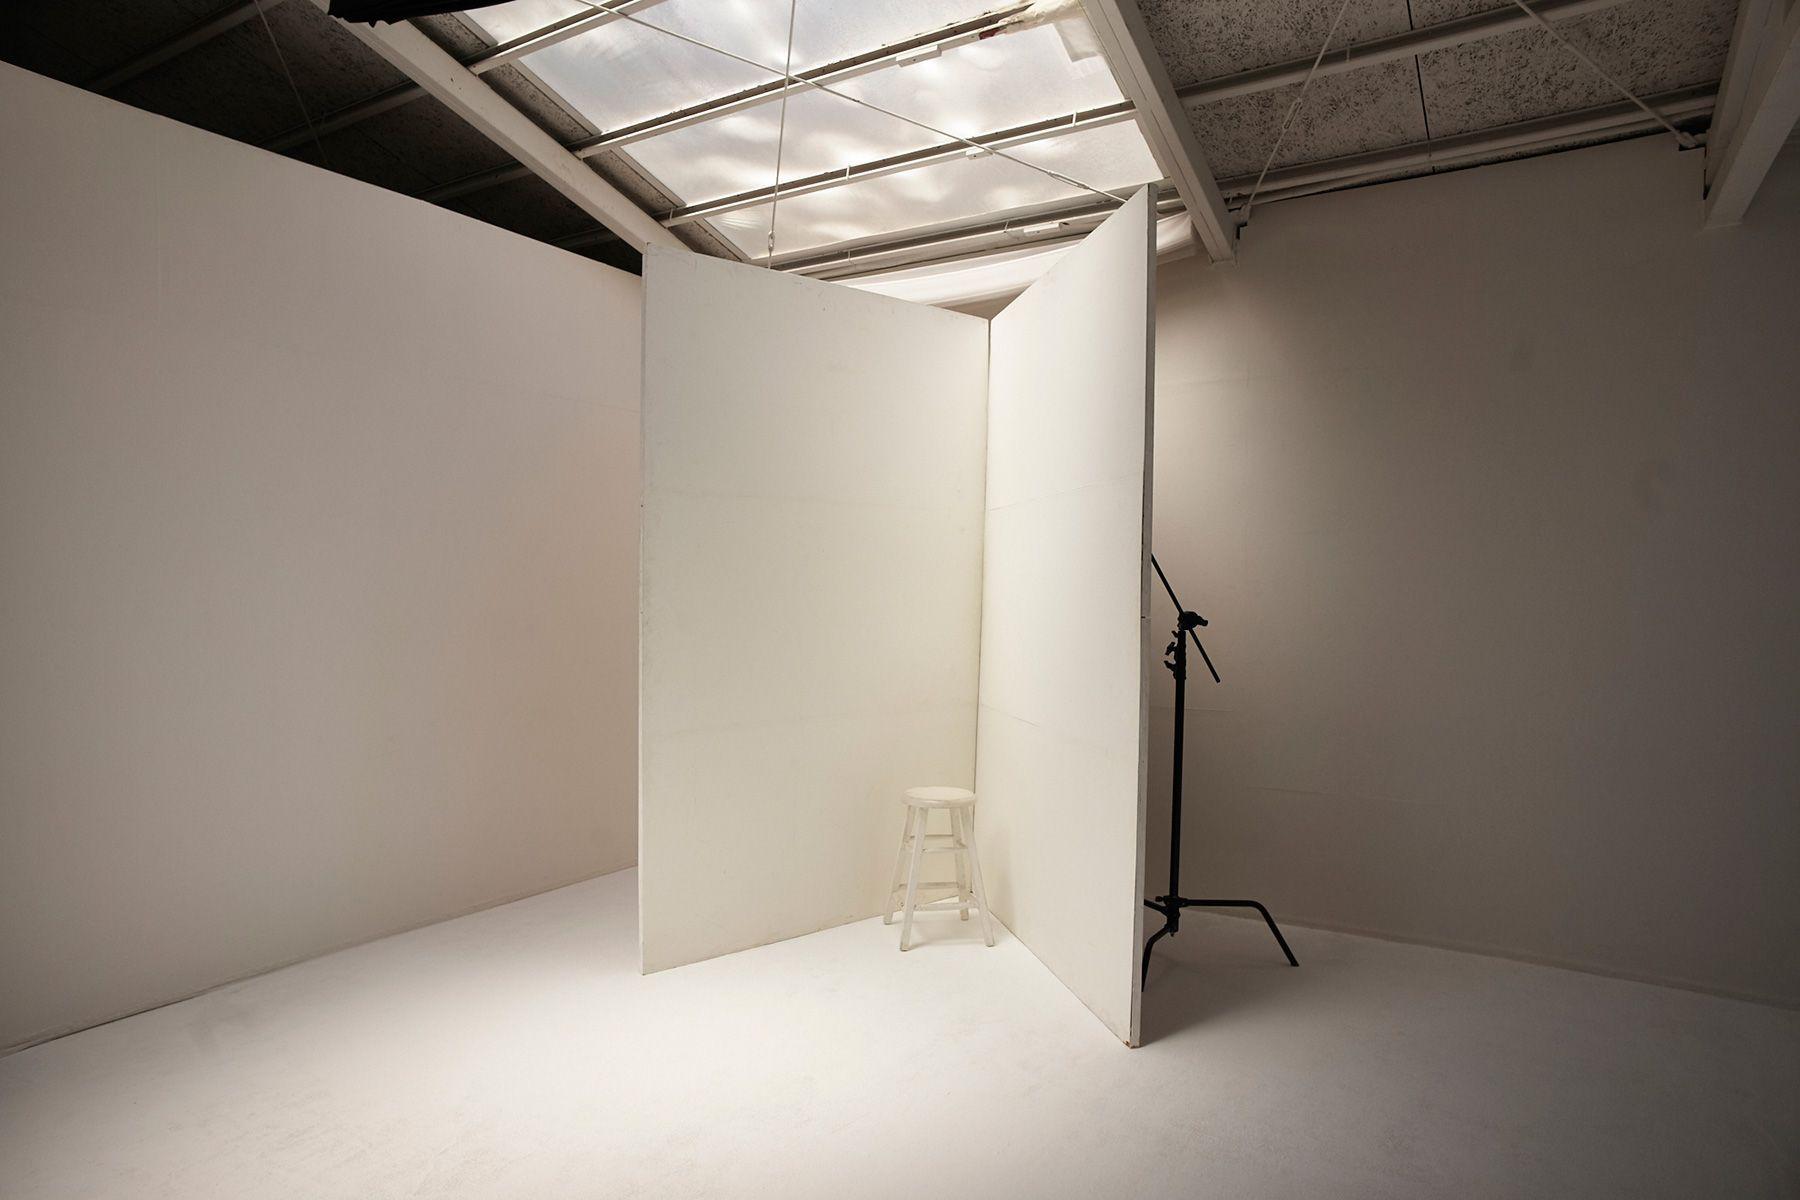 STUDIO MAU(スタジオ マウ)白パネルを組み合わせて